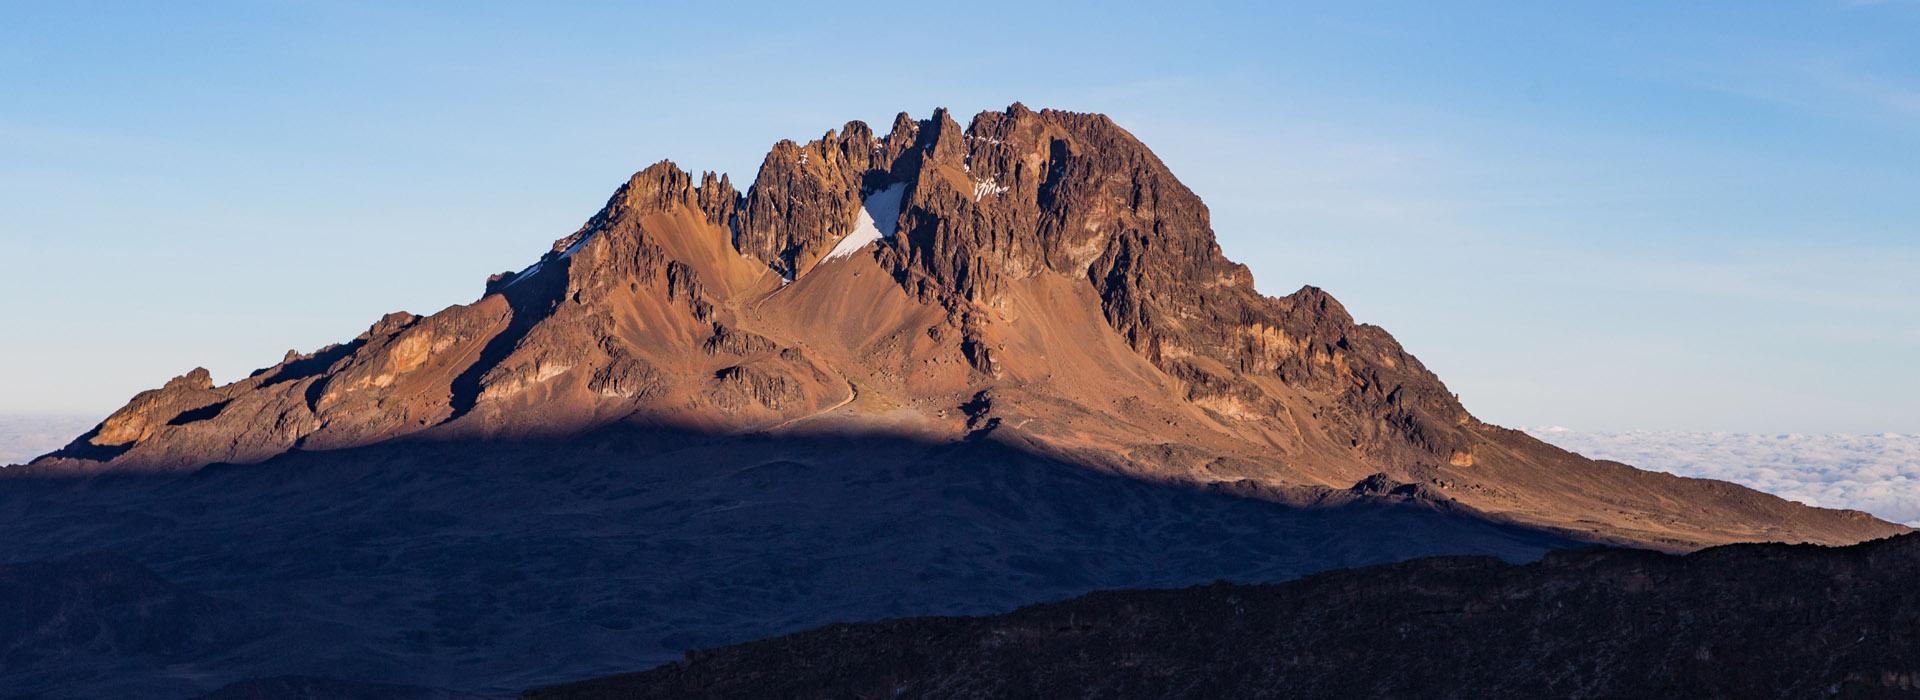 African Adventure Specialists - Mt. Kenya National Park Destination